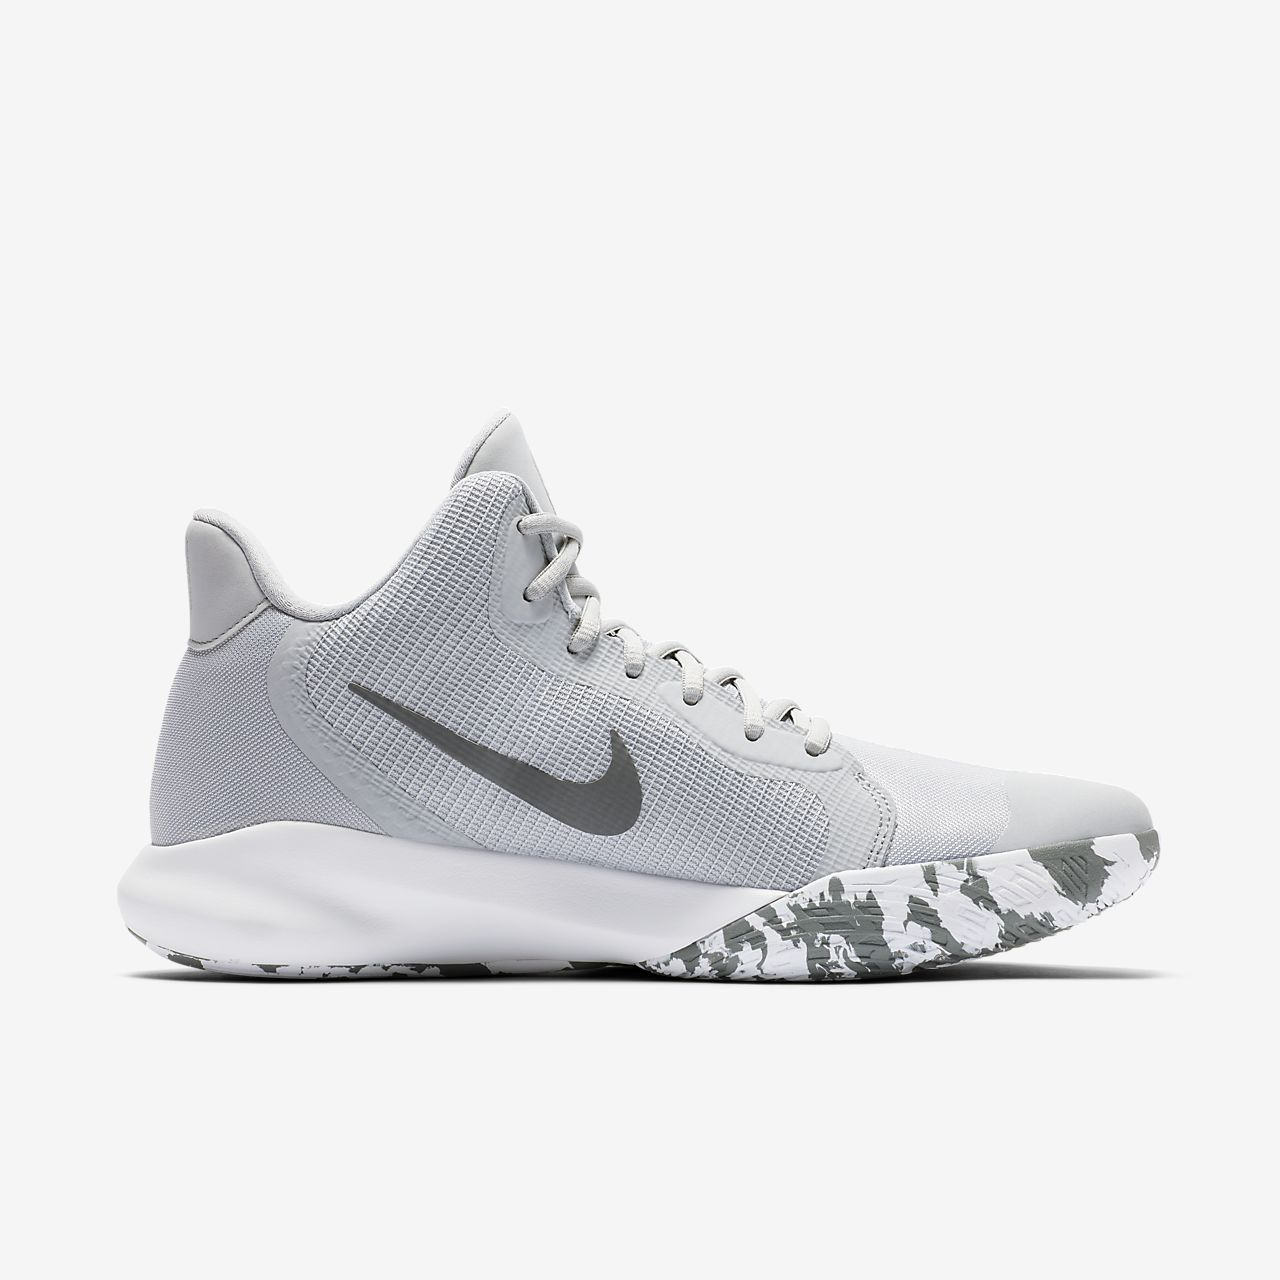 nouveau style 07bd8 e6b12 Nike Precision III Basketball Shoe